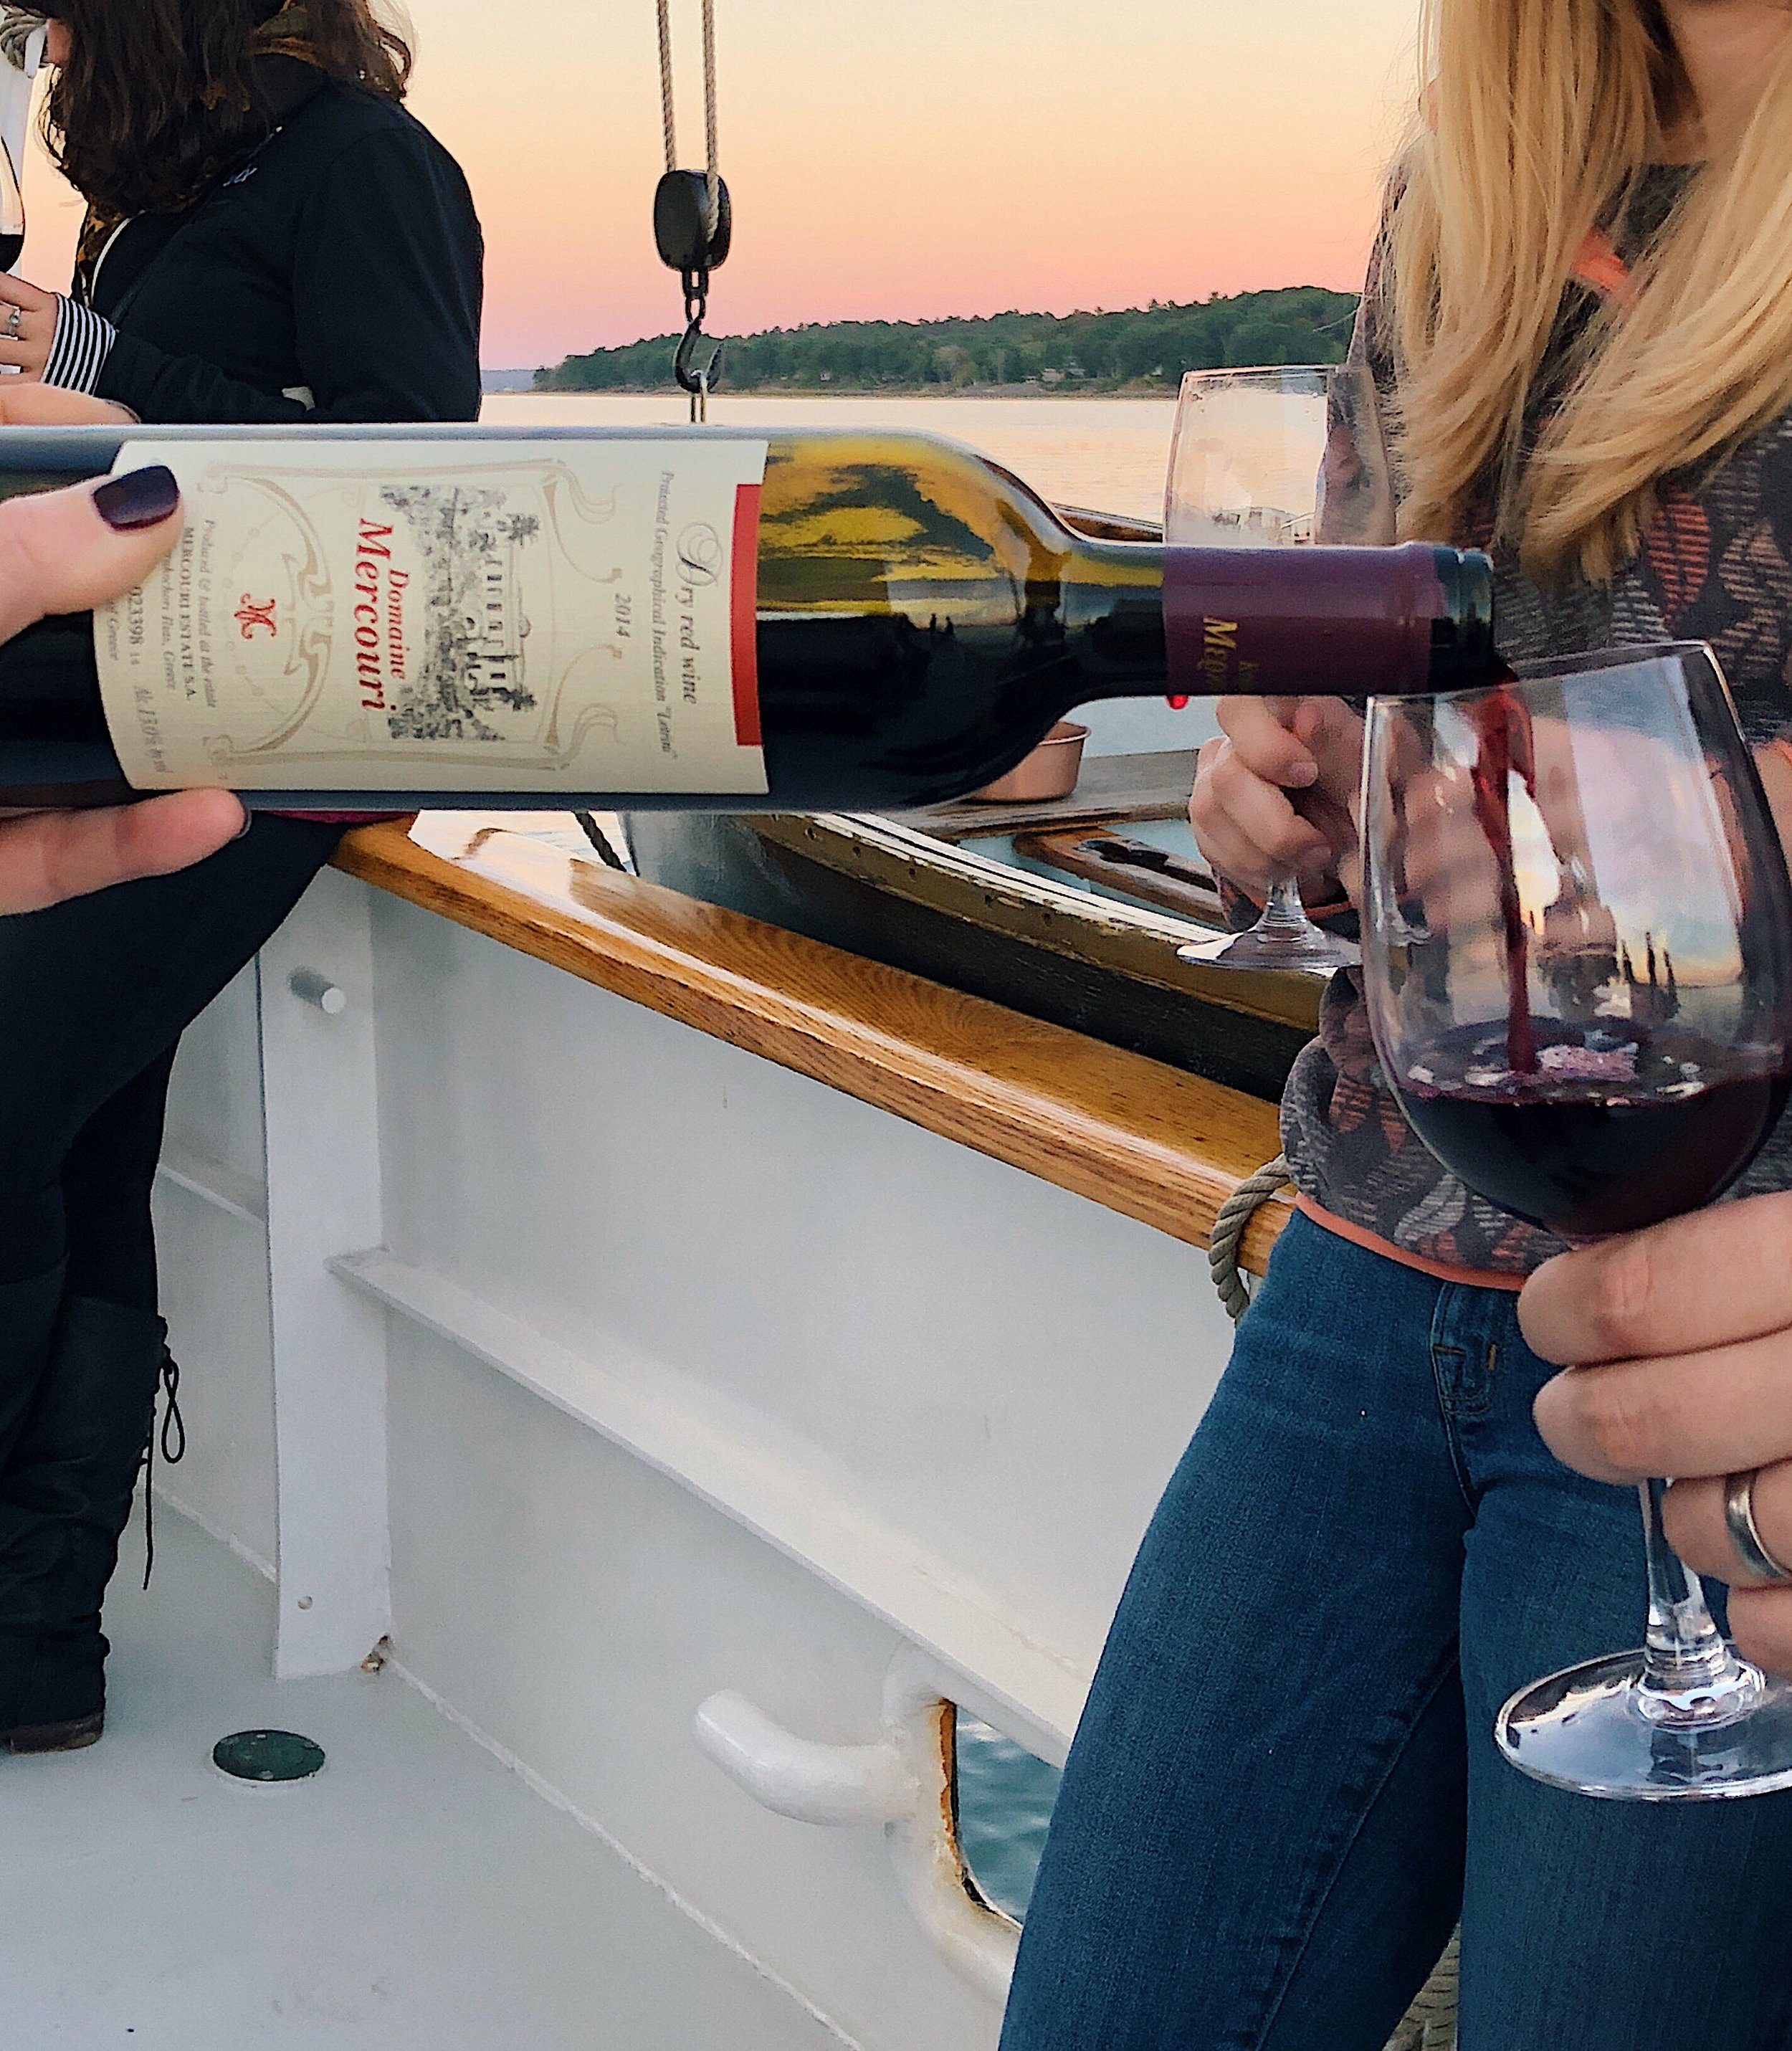 wine-wine-portland-maine-sail-red-pour-greece.jpg